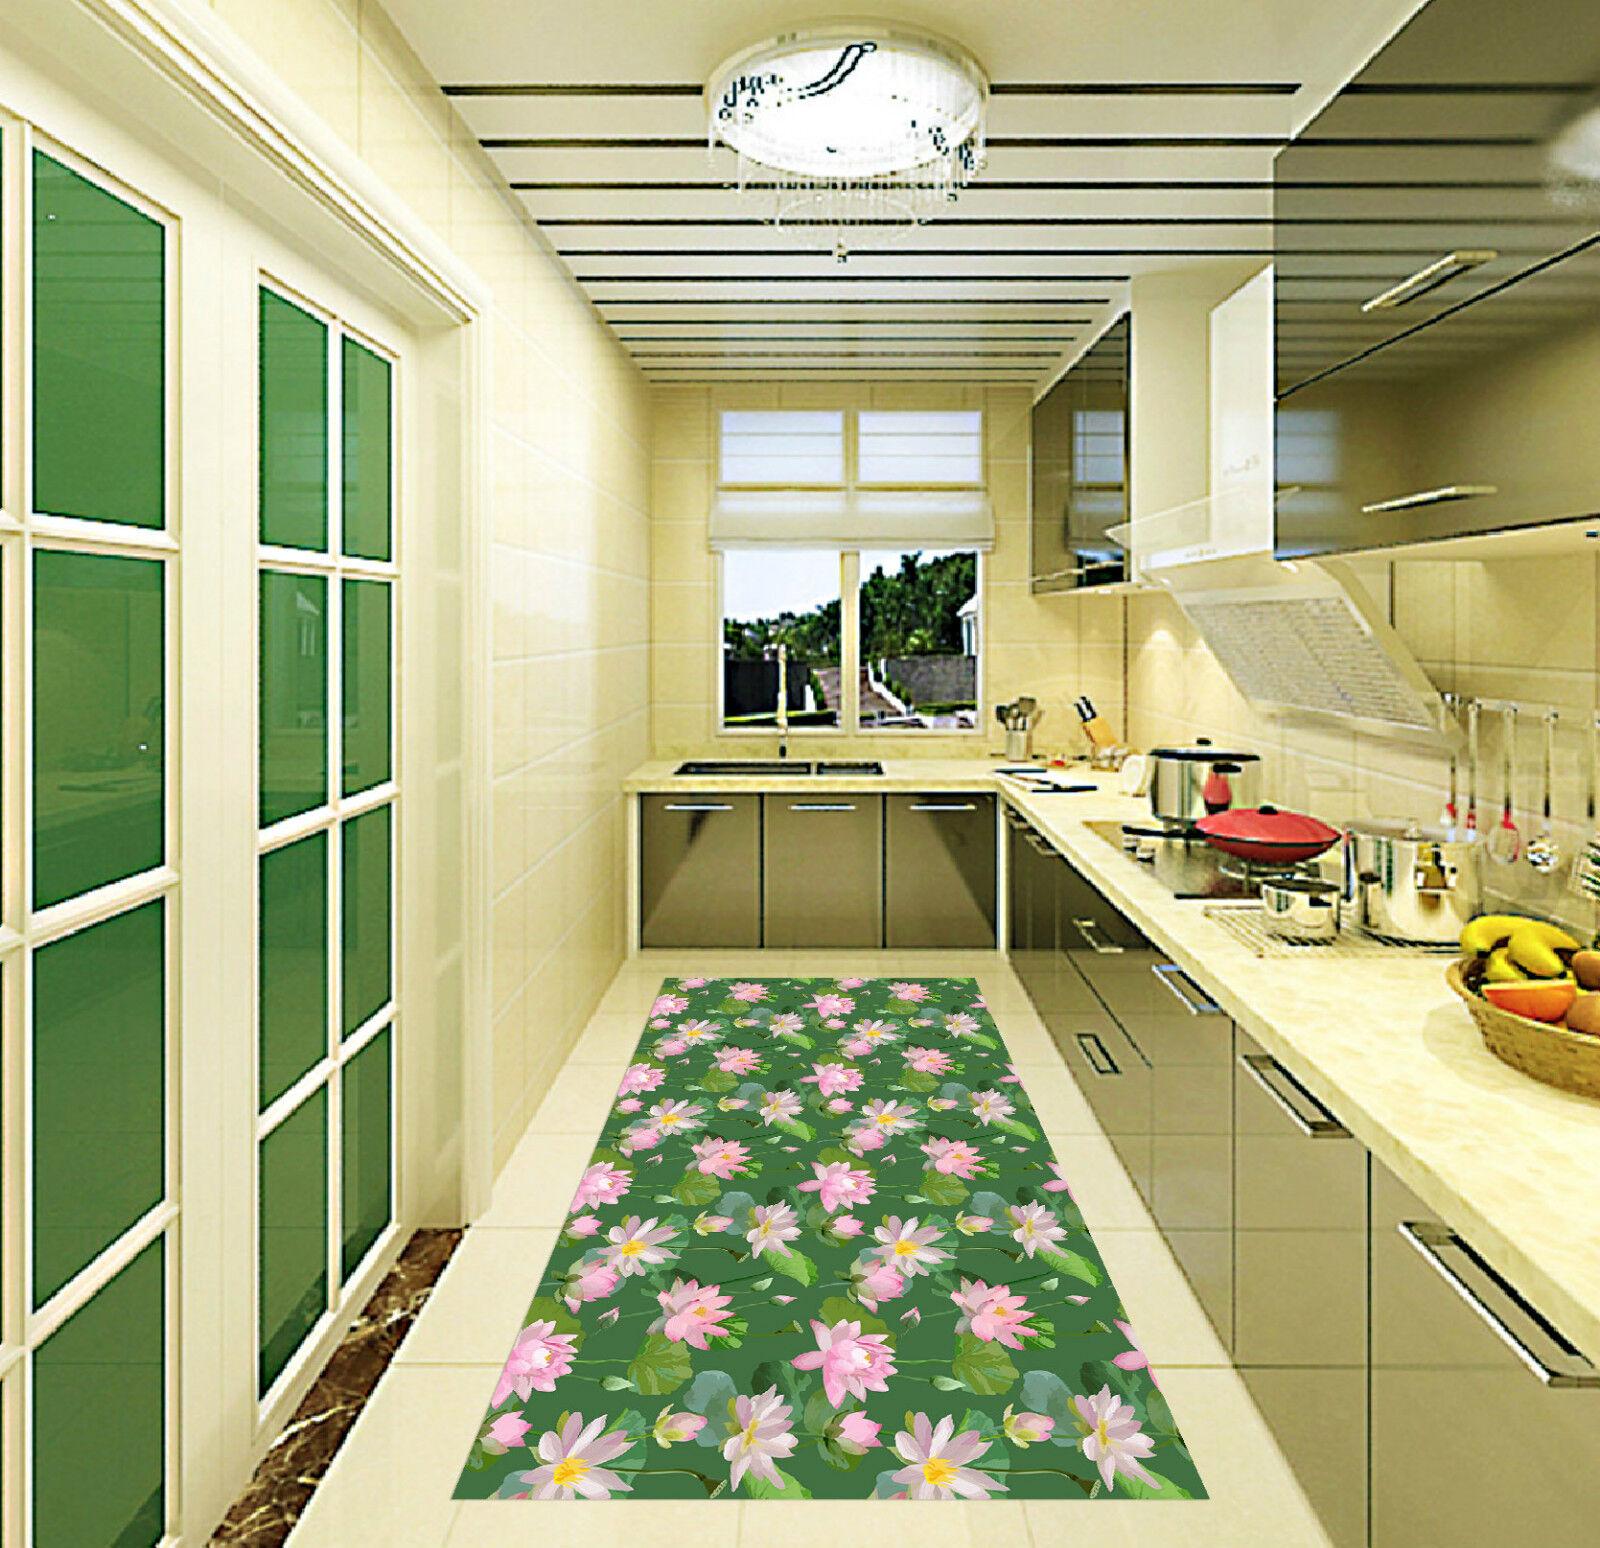 3D Belles Fleurs Motif 263 Décor Mural Murale De Mur Mur Mur De Cuisine AJ WALLPAPER FR 5c8244